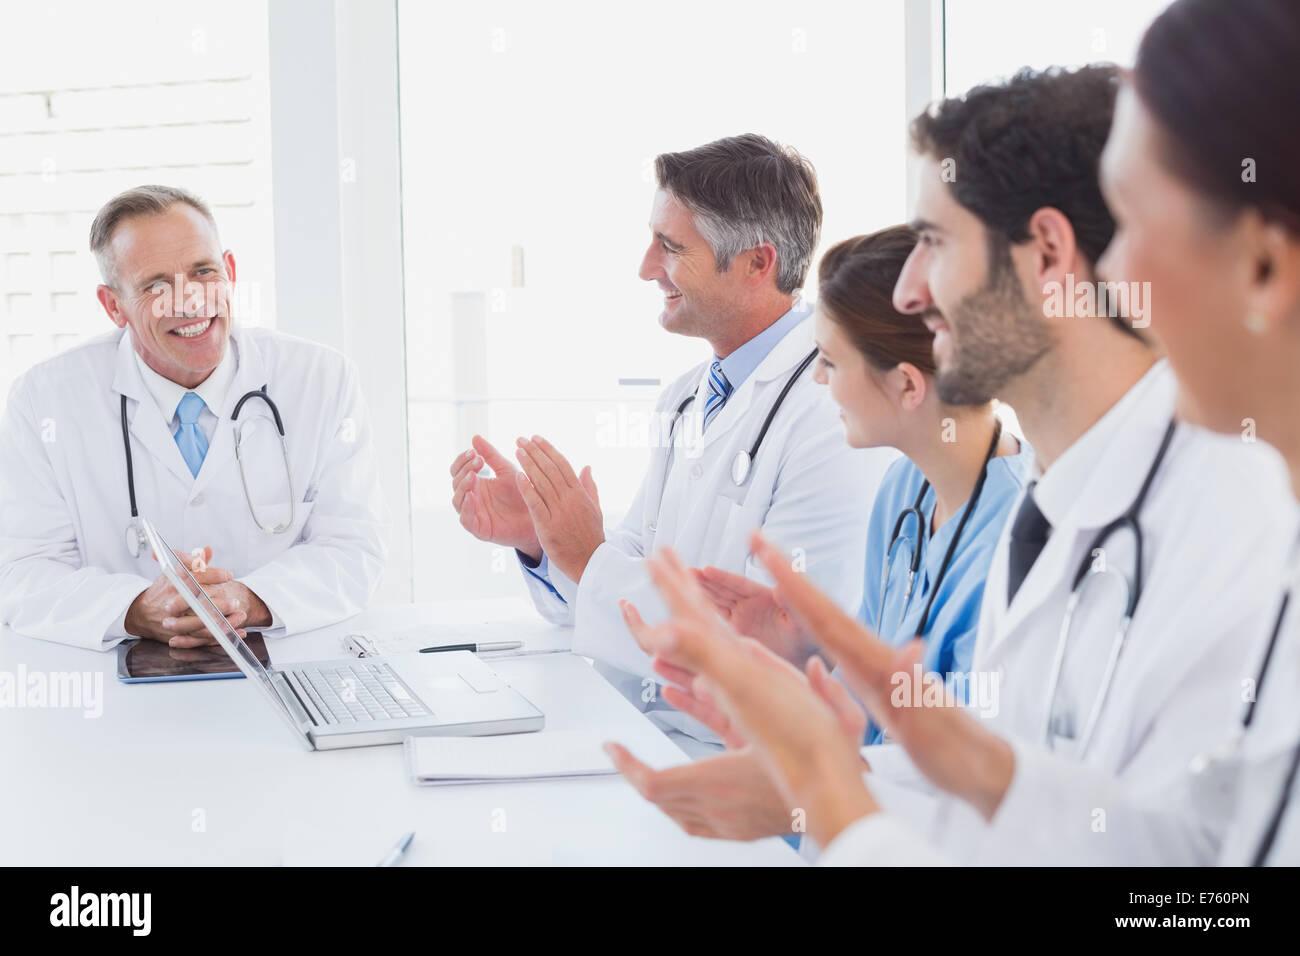 Un autre médecin médecins applaudir Photo Stock